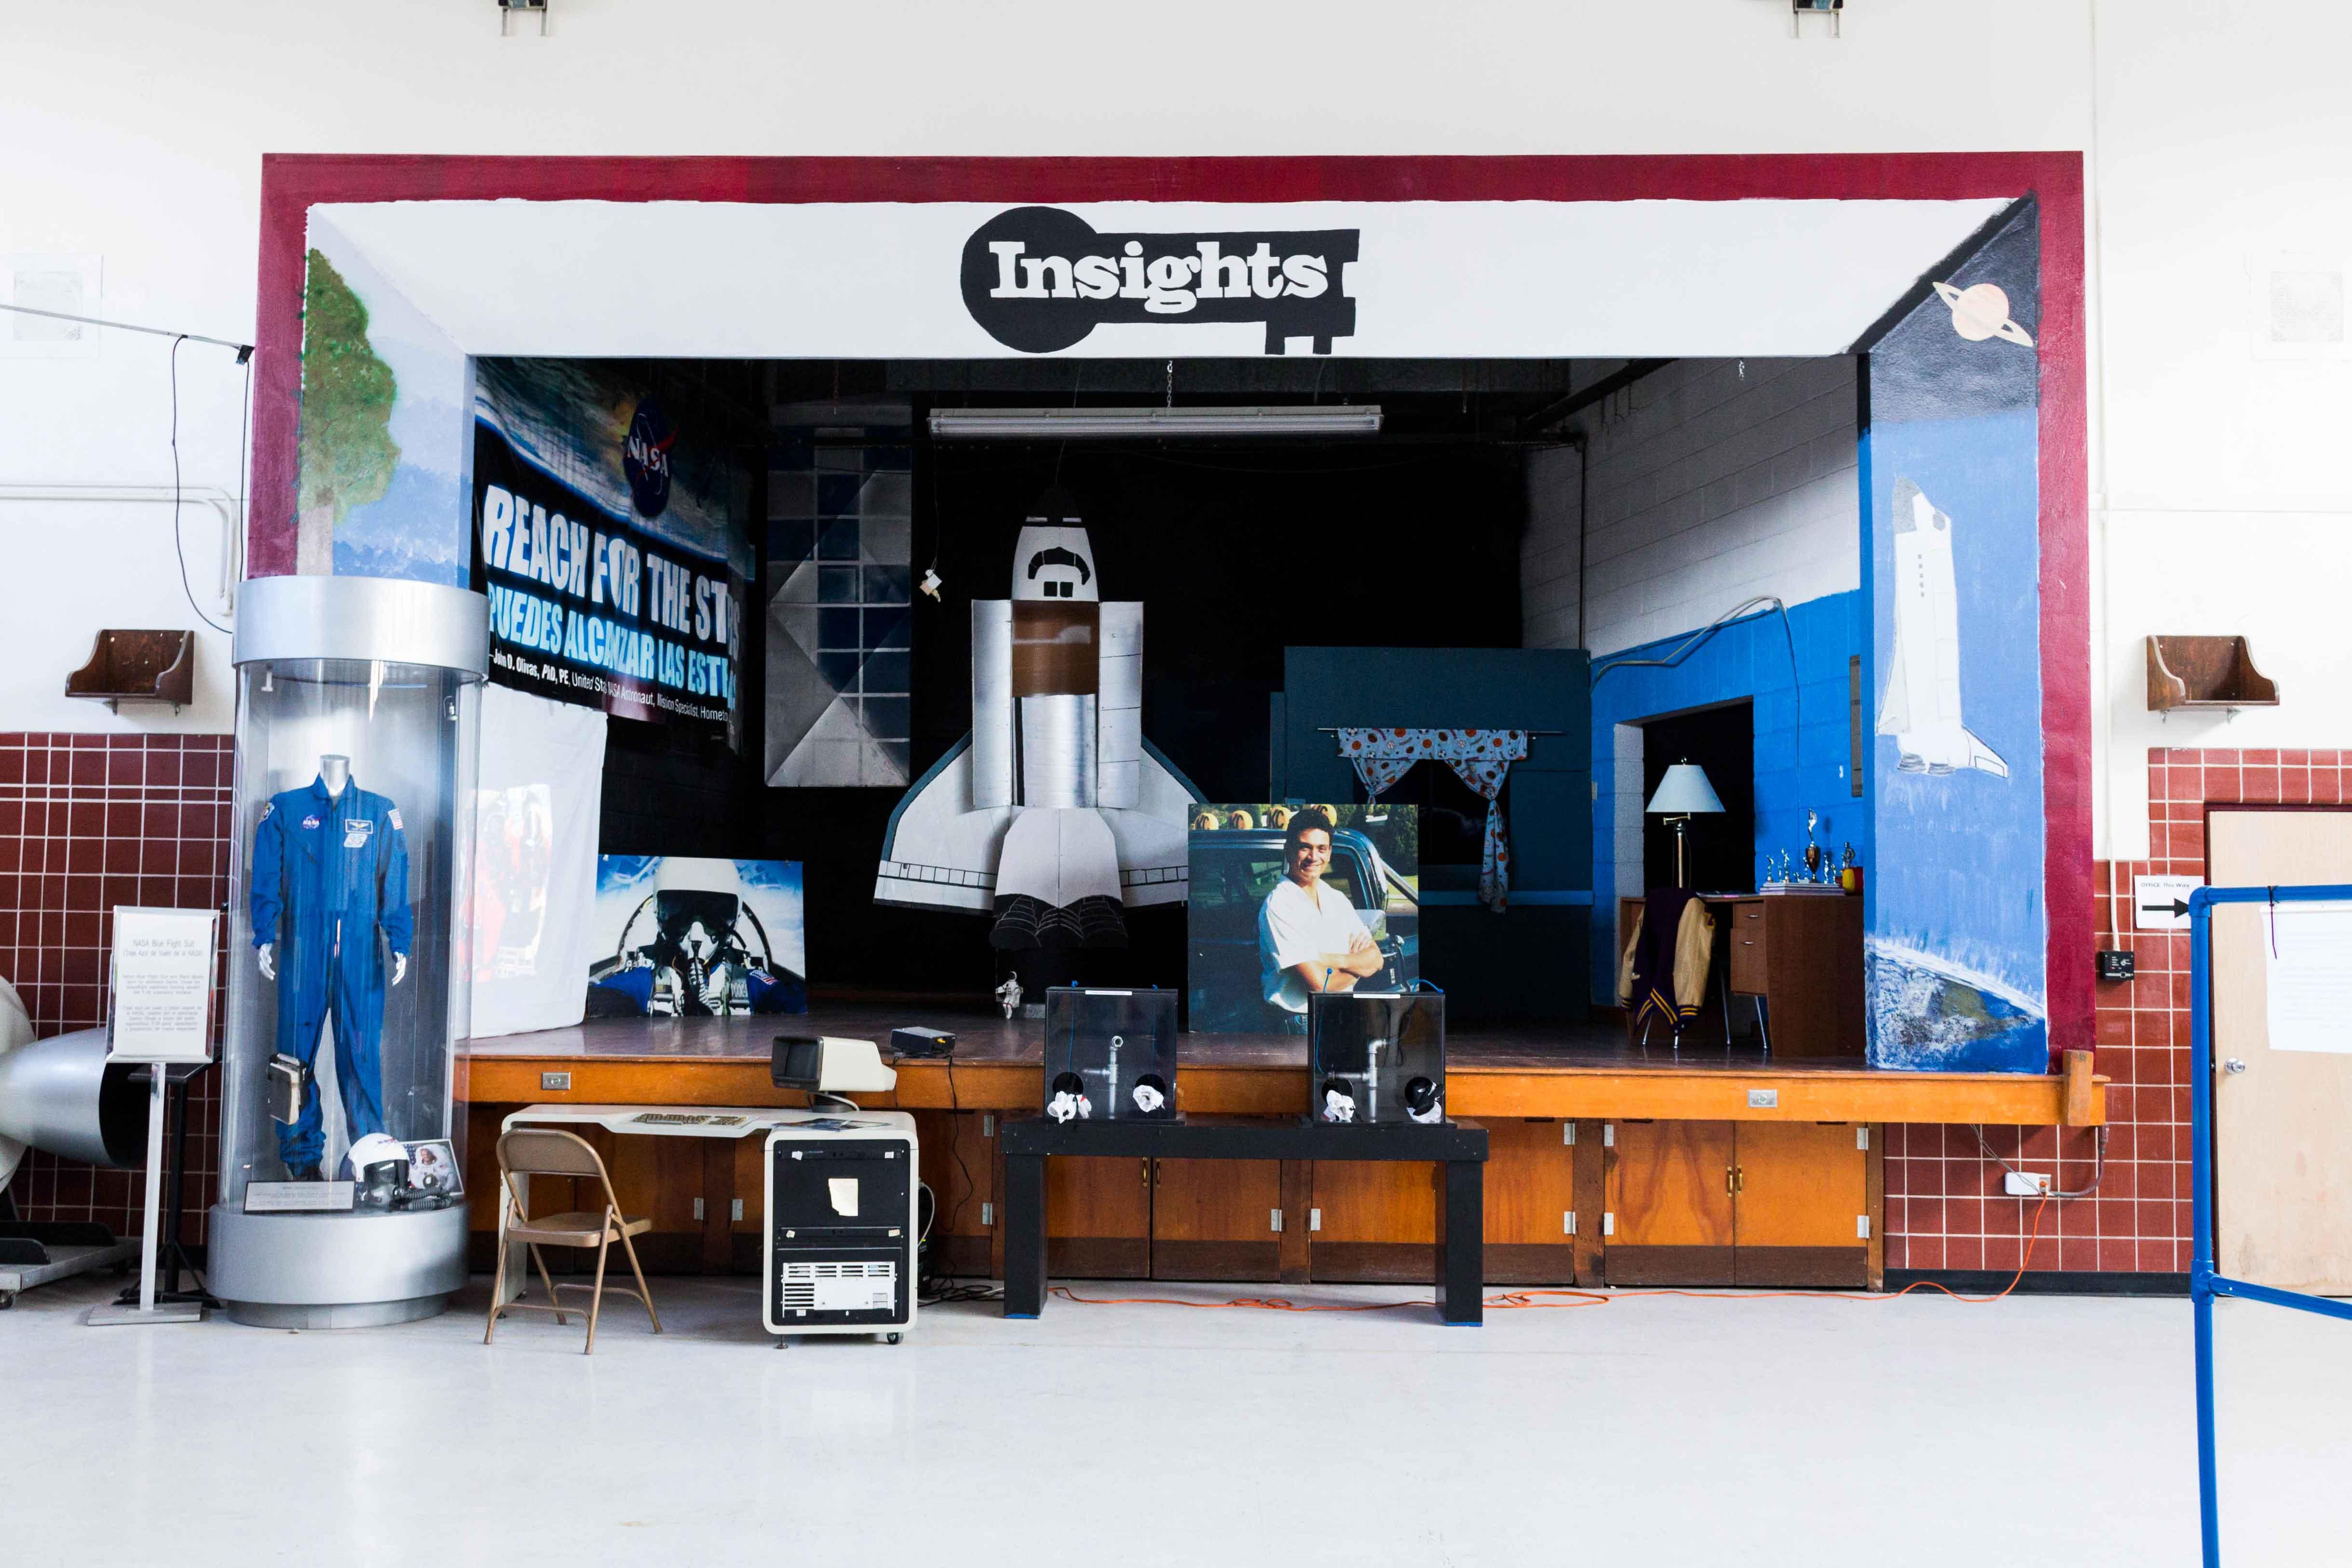 Insights El Paso Science Center is located at 521 Tays St, El Paso, TX.